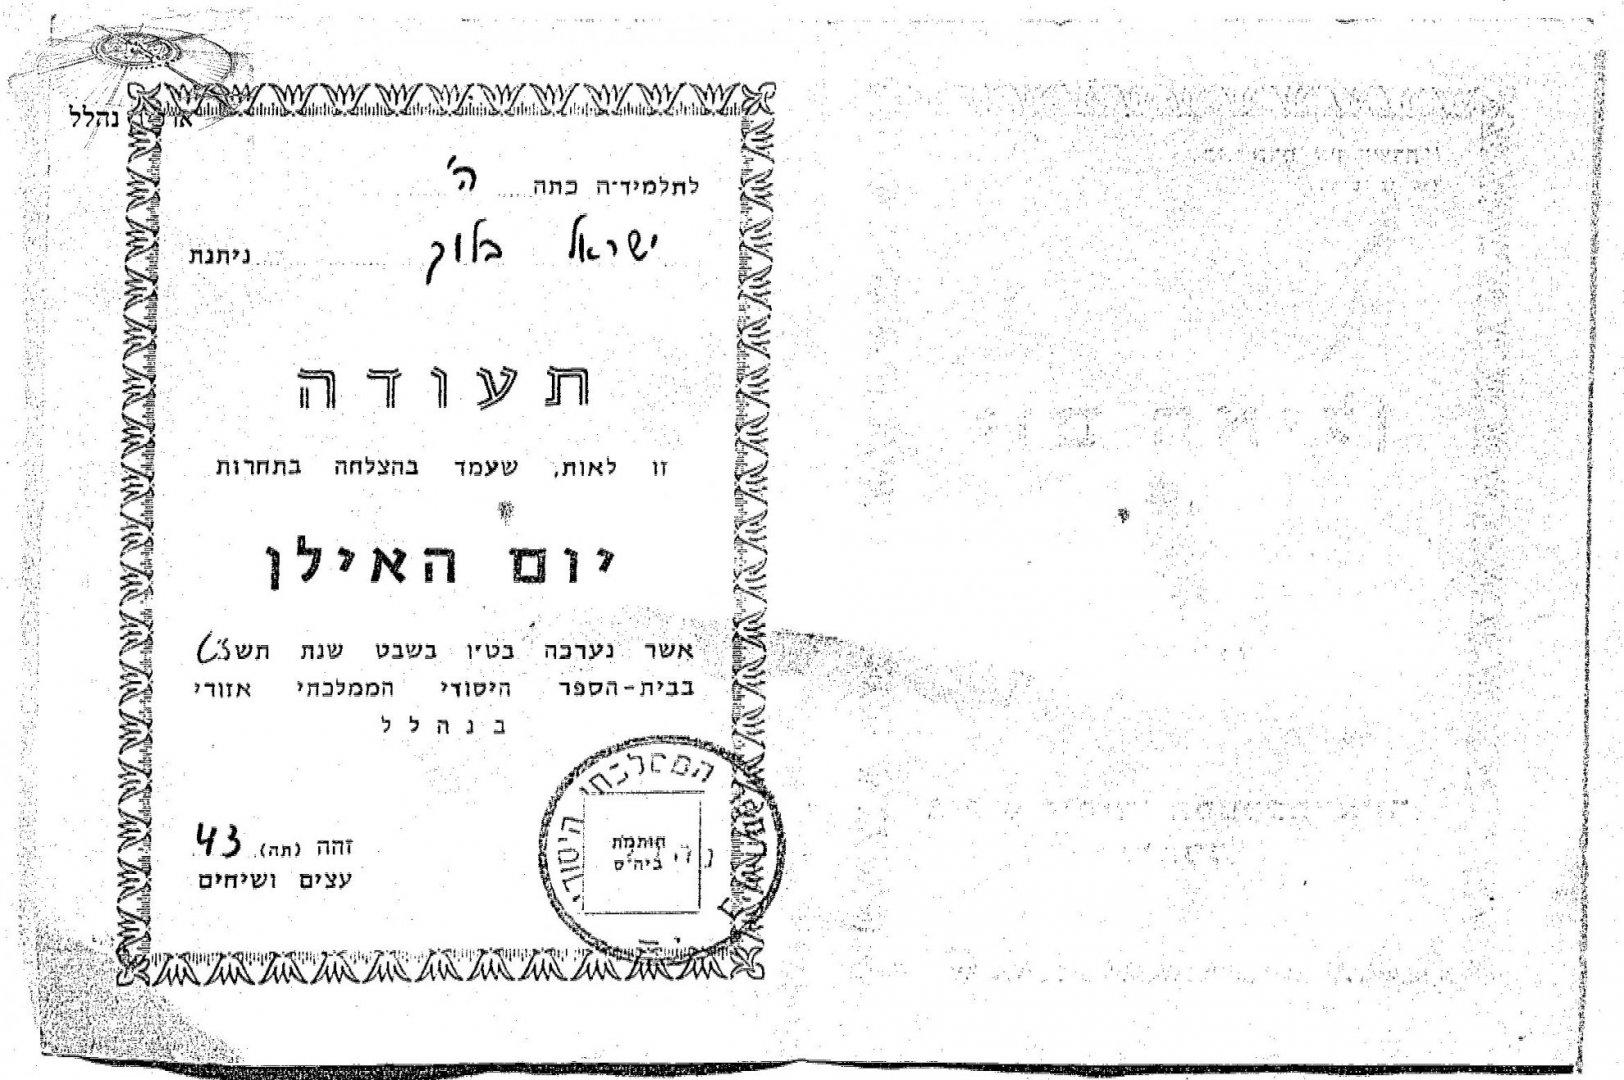 2 00280169 tif  תעודת ים האילן ישראל בלוך